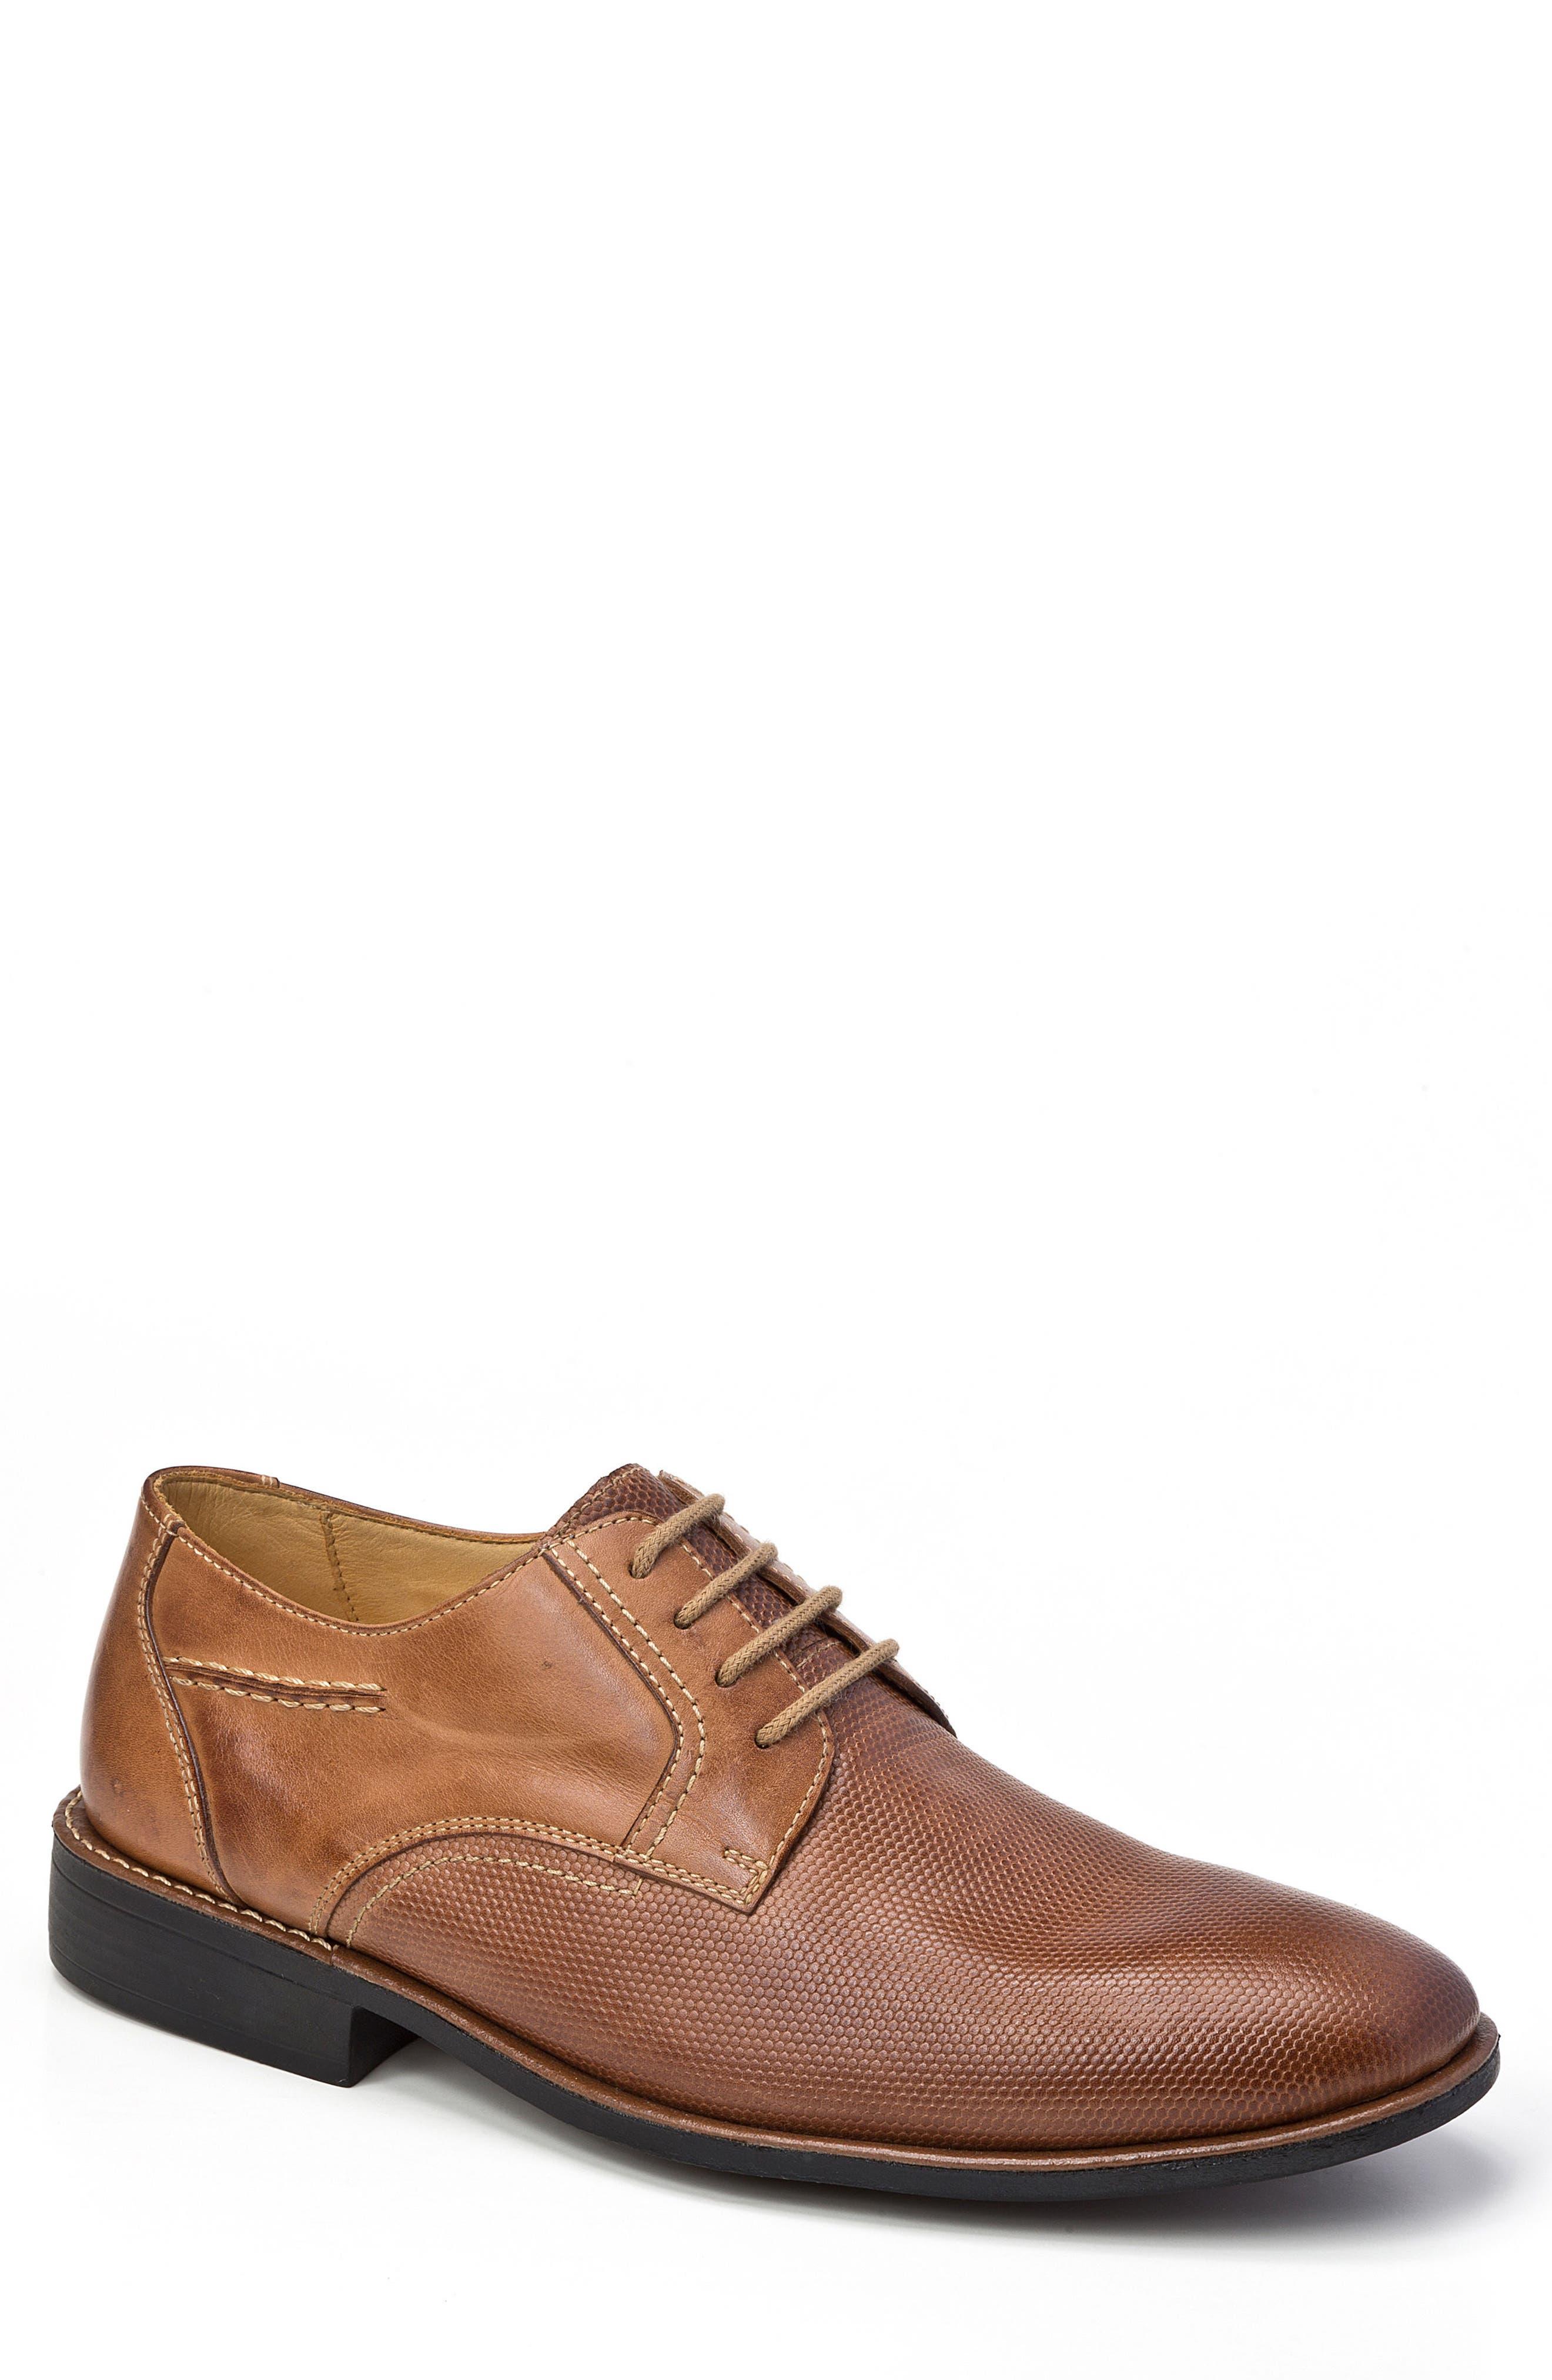 Trenso Plain Toe Derby,                             Main thumbnail 1, color,                             Tan Leather